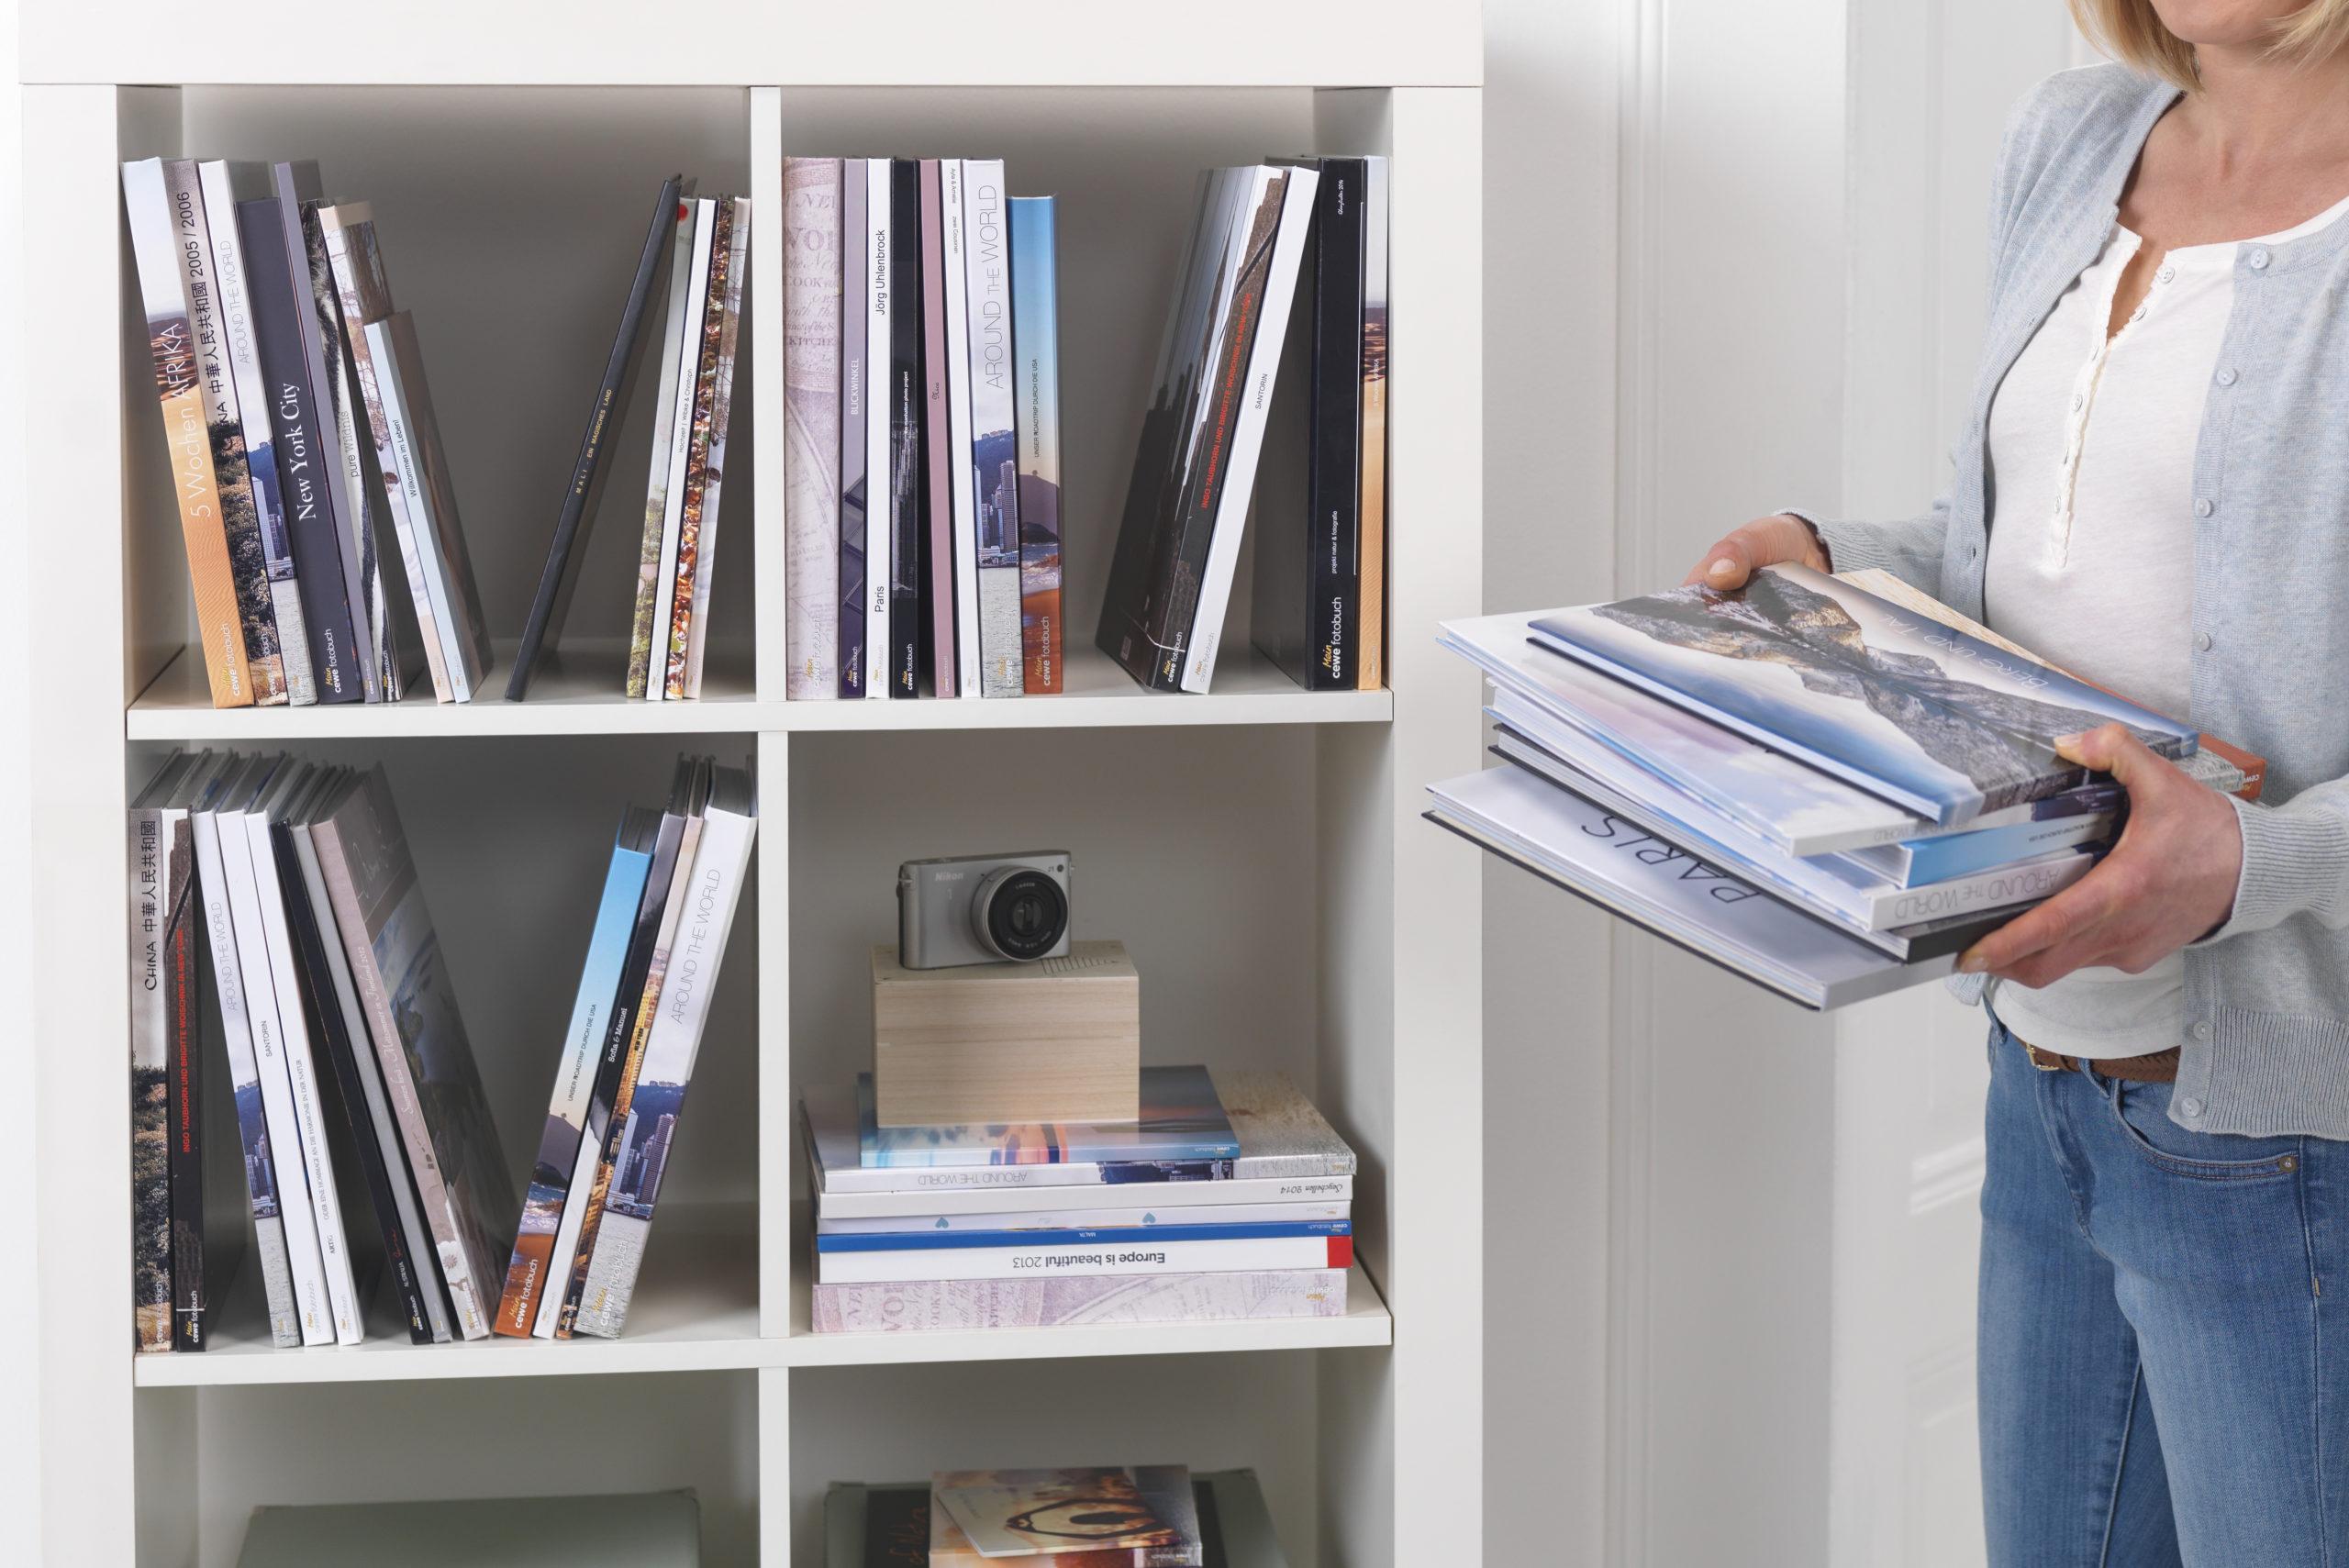 cewe fotokniha, fotokniha, knihovna